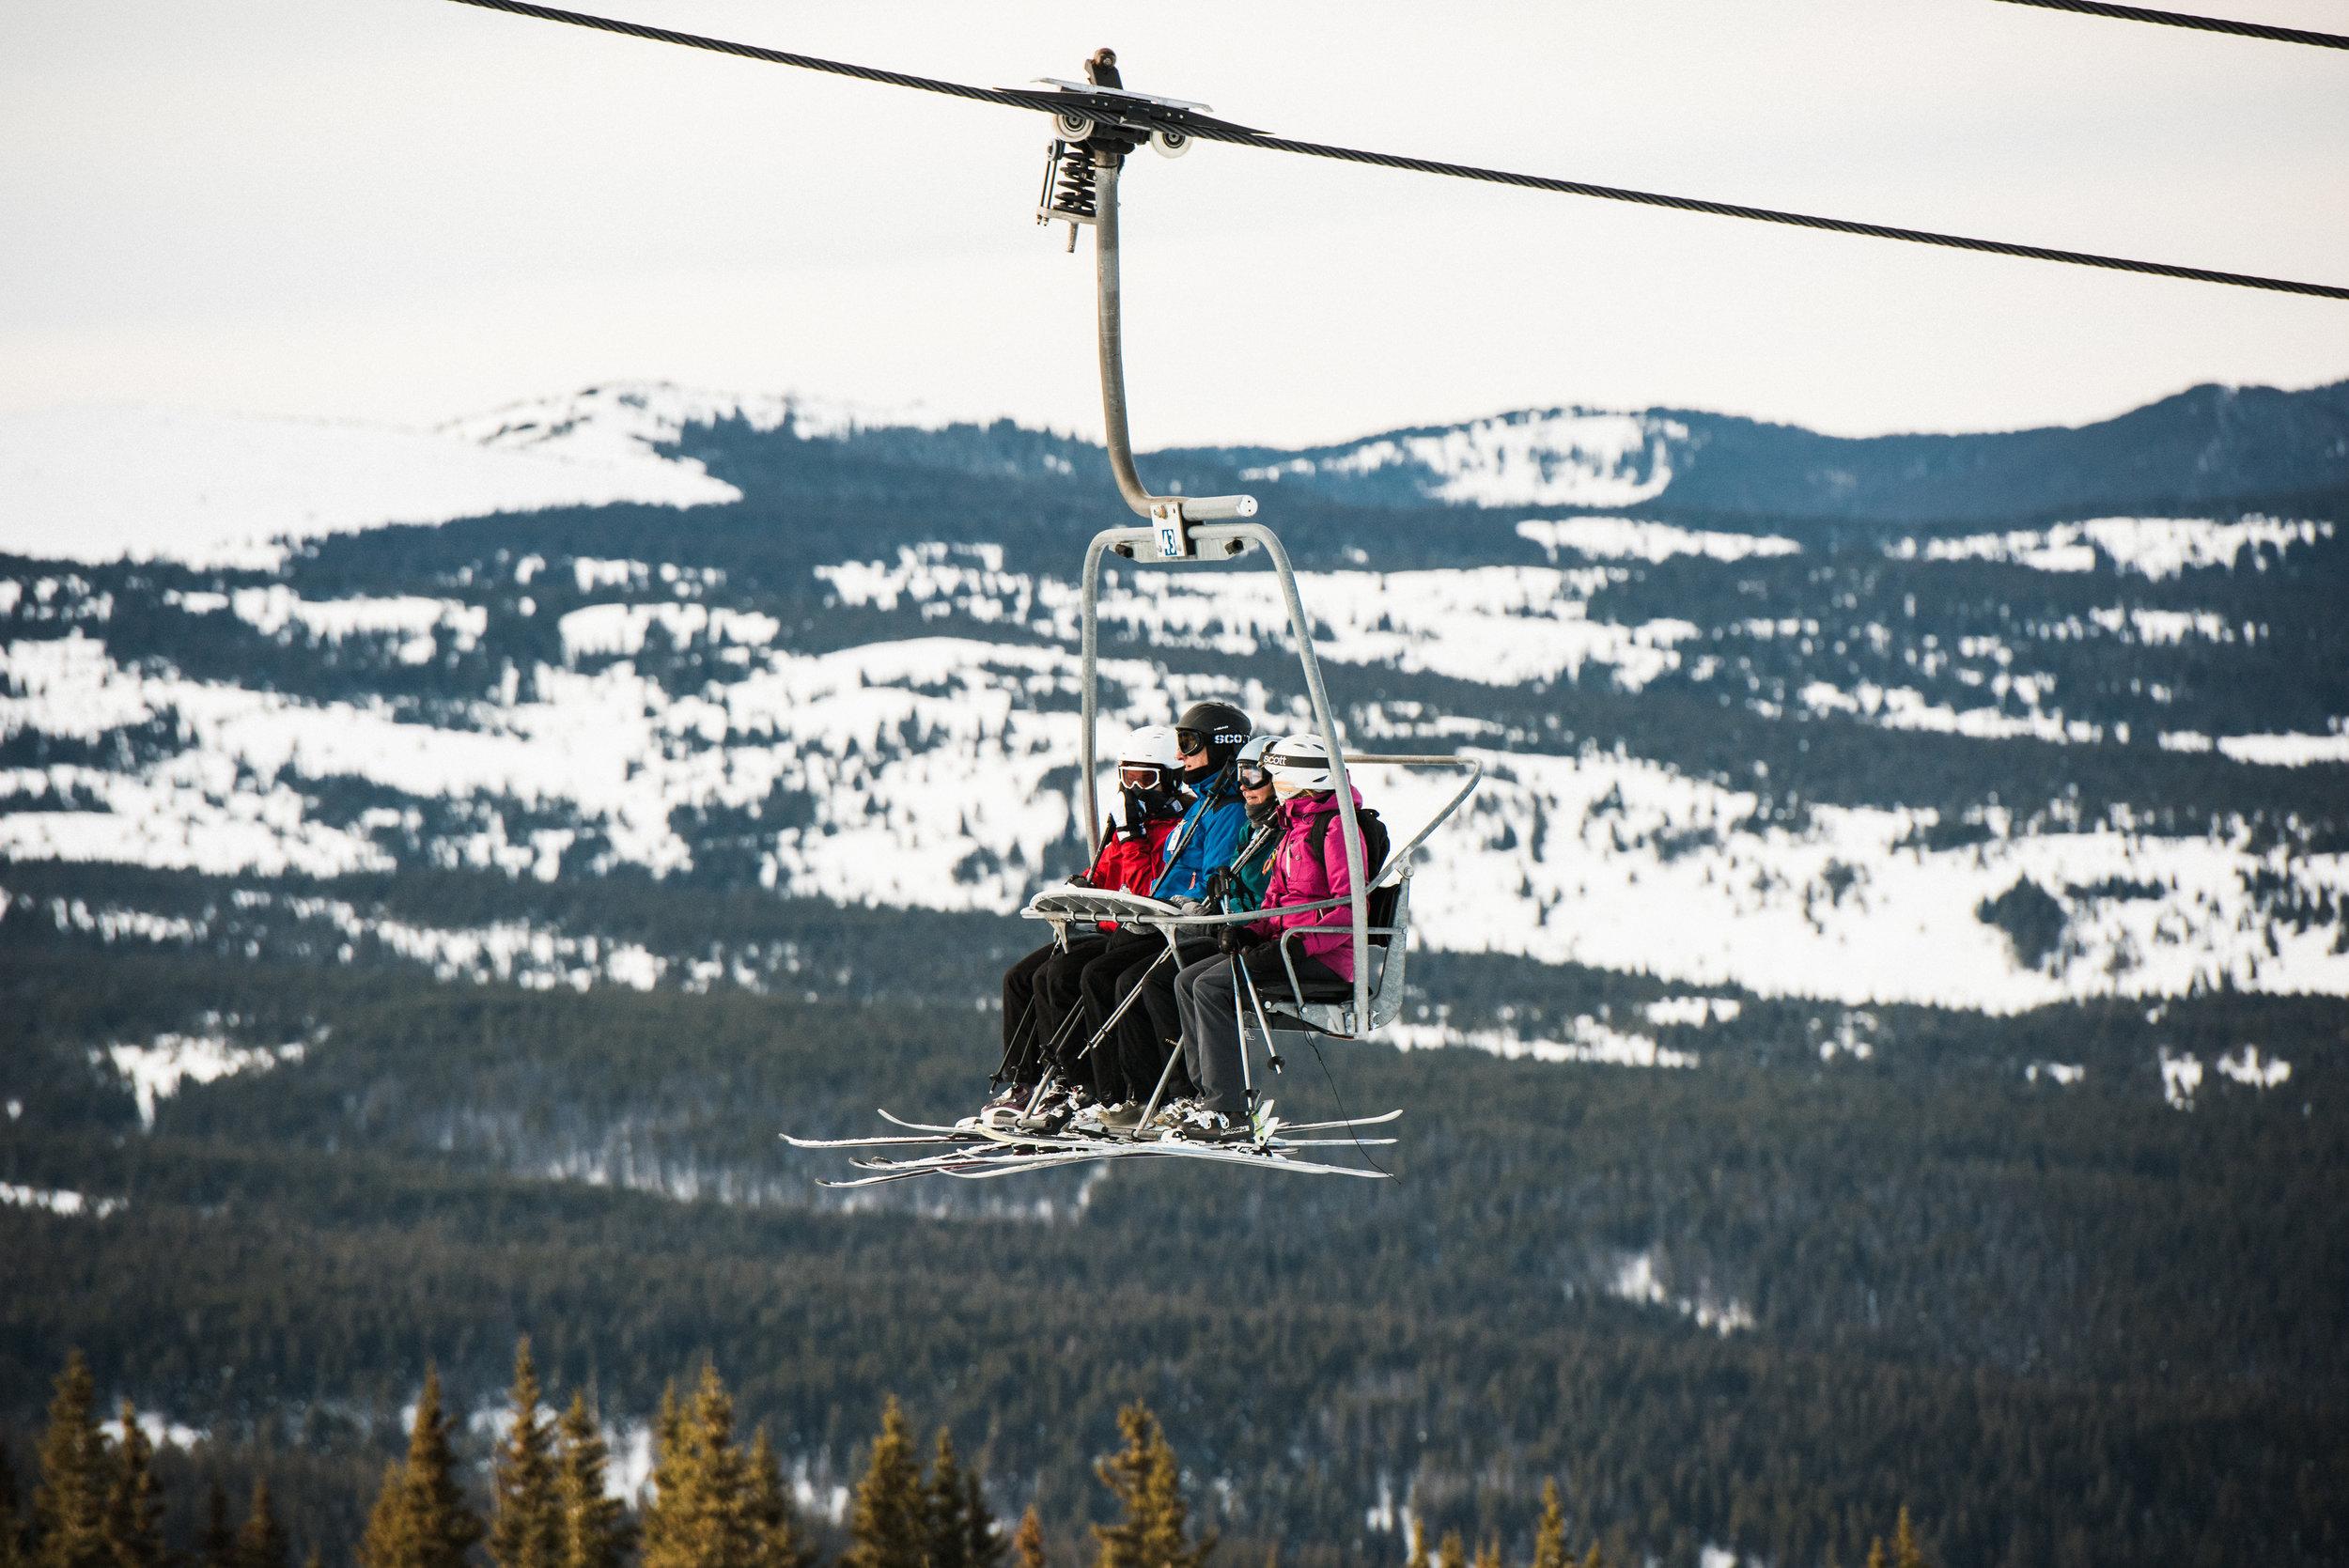 TaraShupe_Outdoor_Photographer_Loweprobags_Colorado_Copper_Mountains_Ski_72.jpg